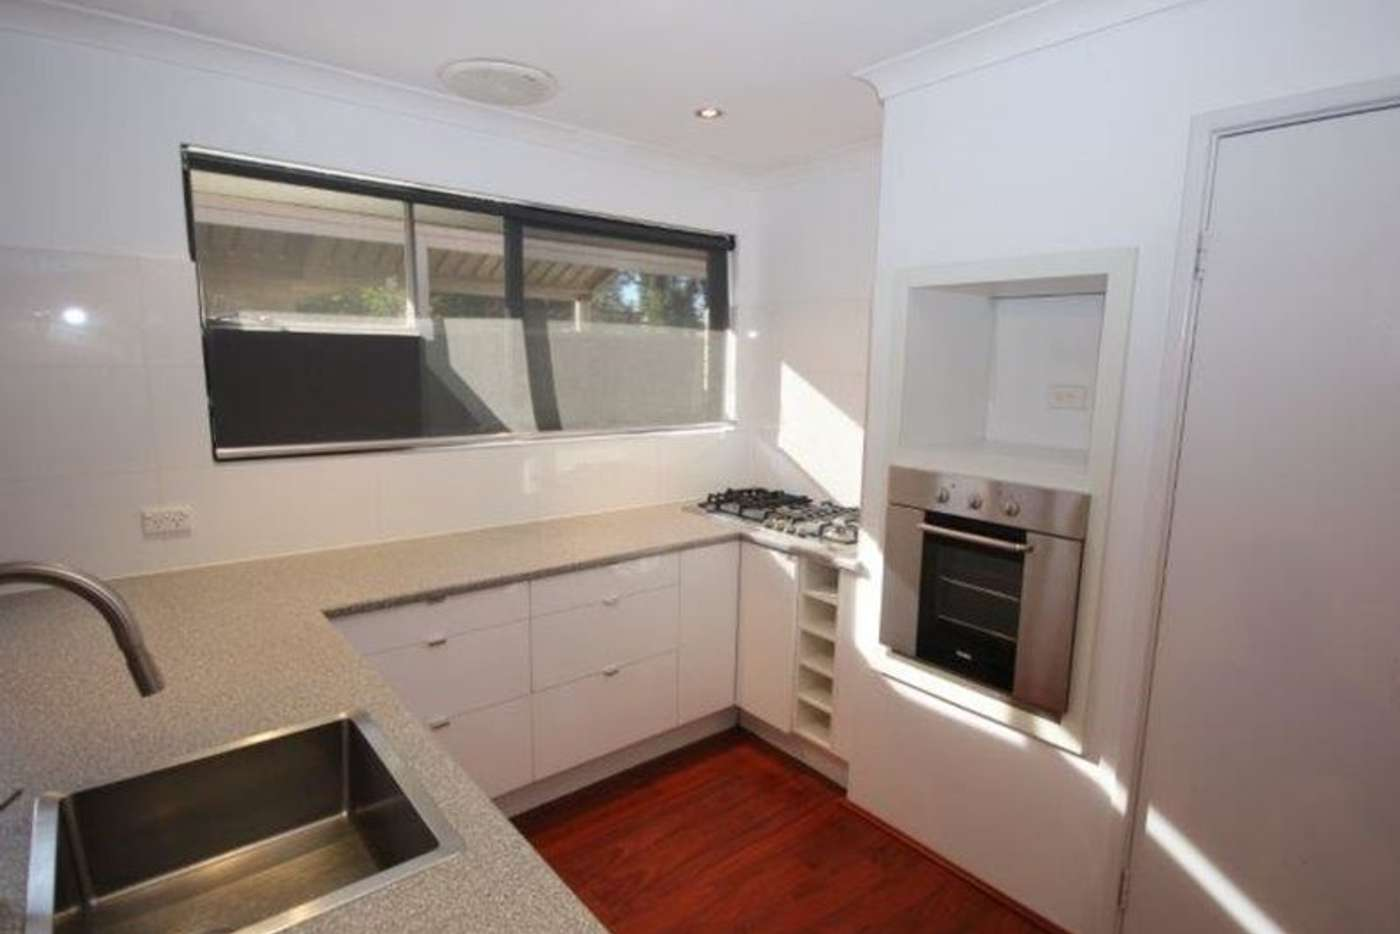 Sixth view of Homely house listing, 106 Tibradden Circle, Ascot WA 6104